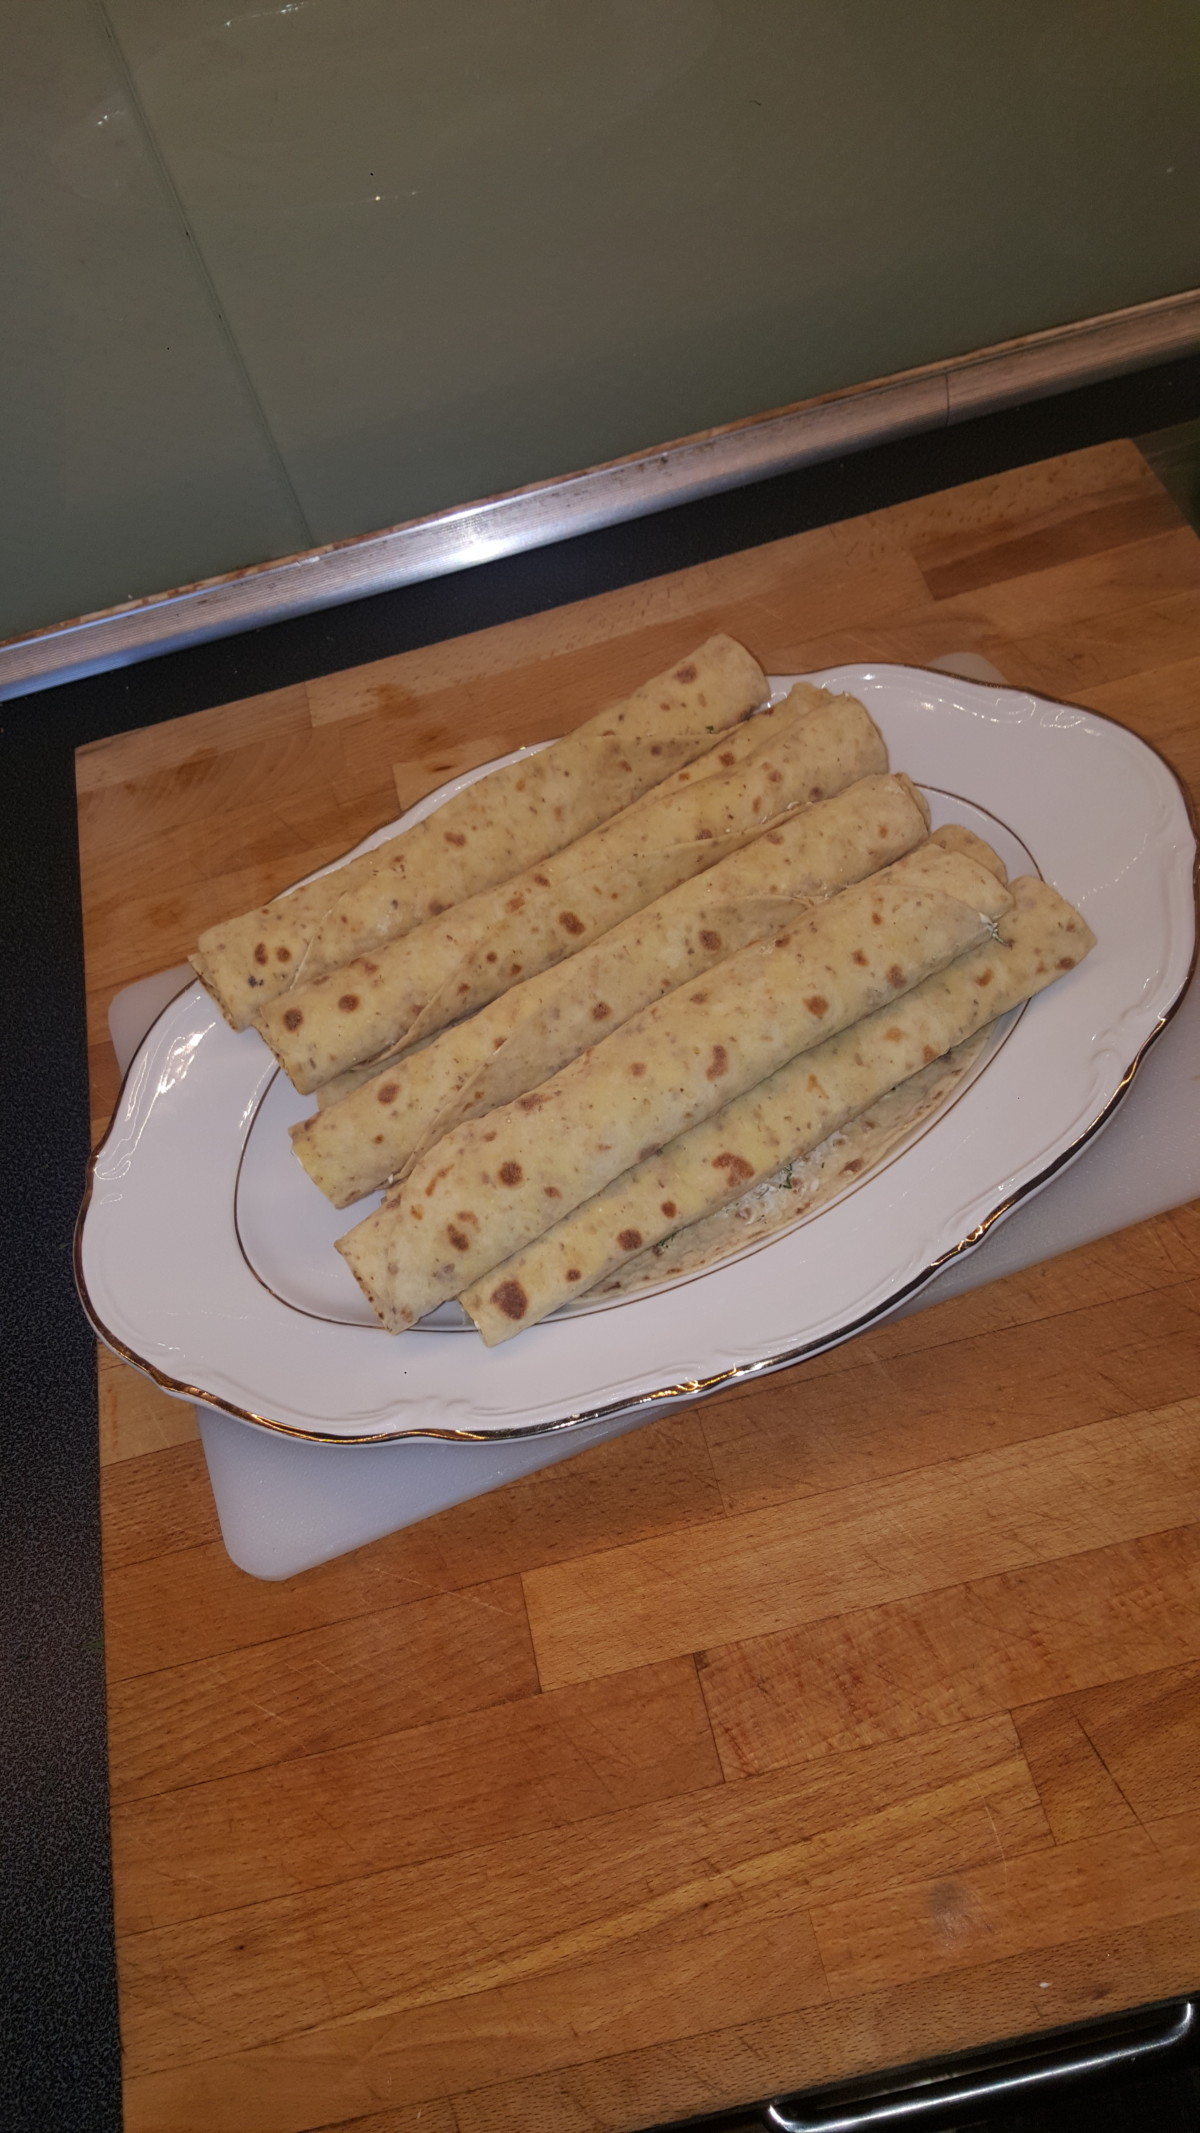 laksewrap-lakswrap-wrap-laks-lakse-røktlaks-røkalaks-dill-lefse-lakslefse-lakselefse-mat-tapas-mattips-enekeltålage-matpå123-ferdigpå123-oppskrift-lettålage-matforslag-blogger-isalicious-bloggno-middag